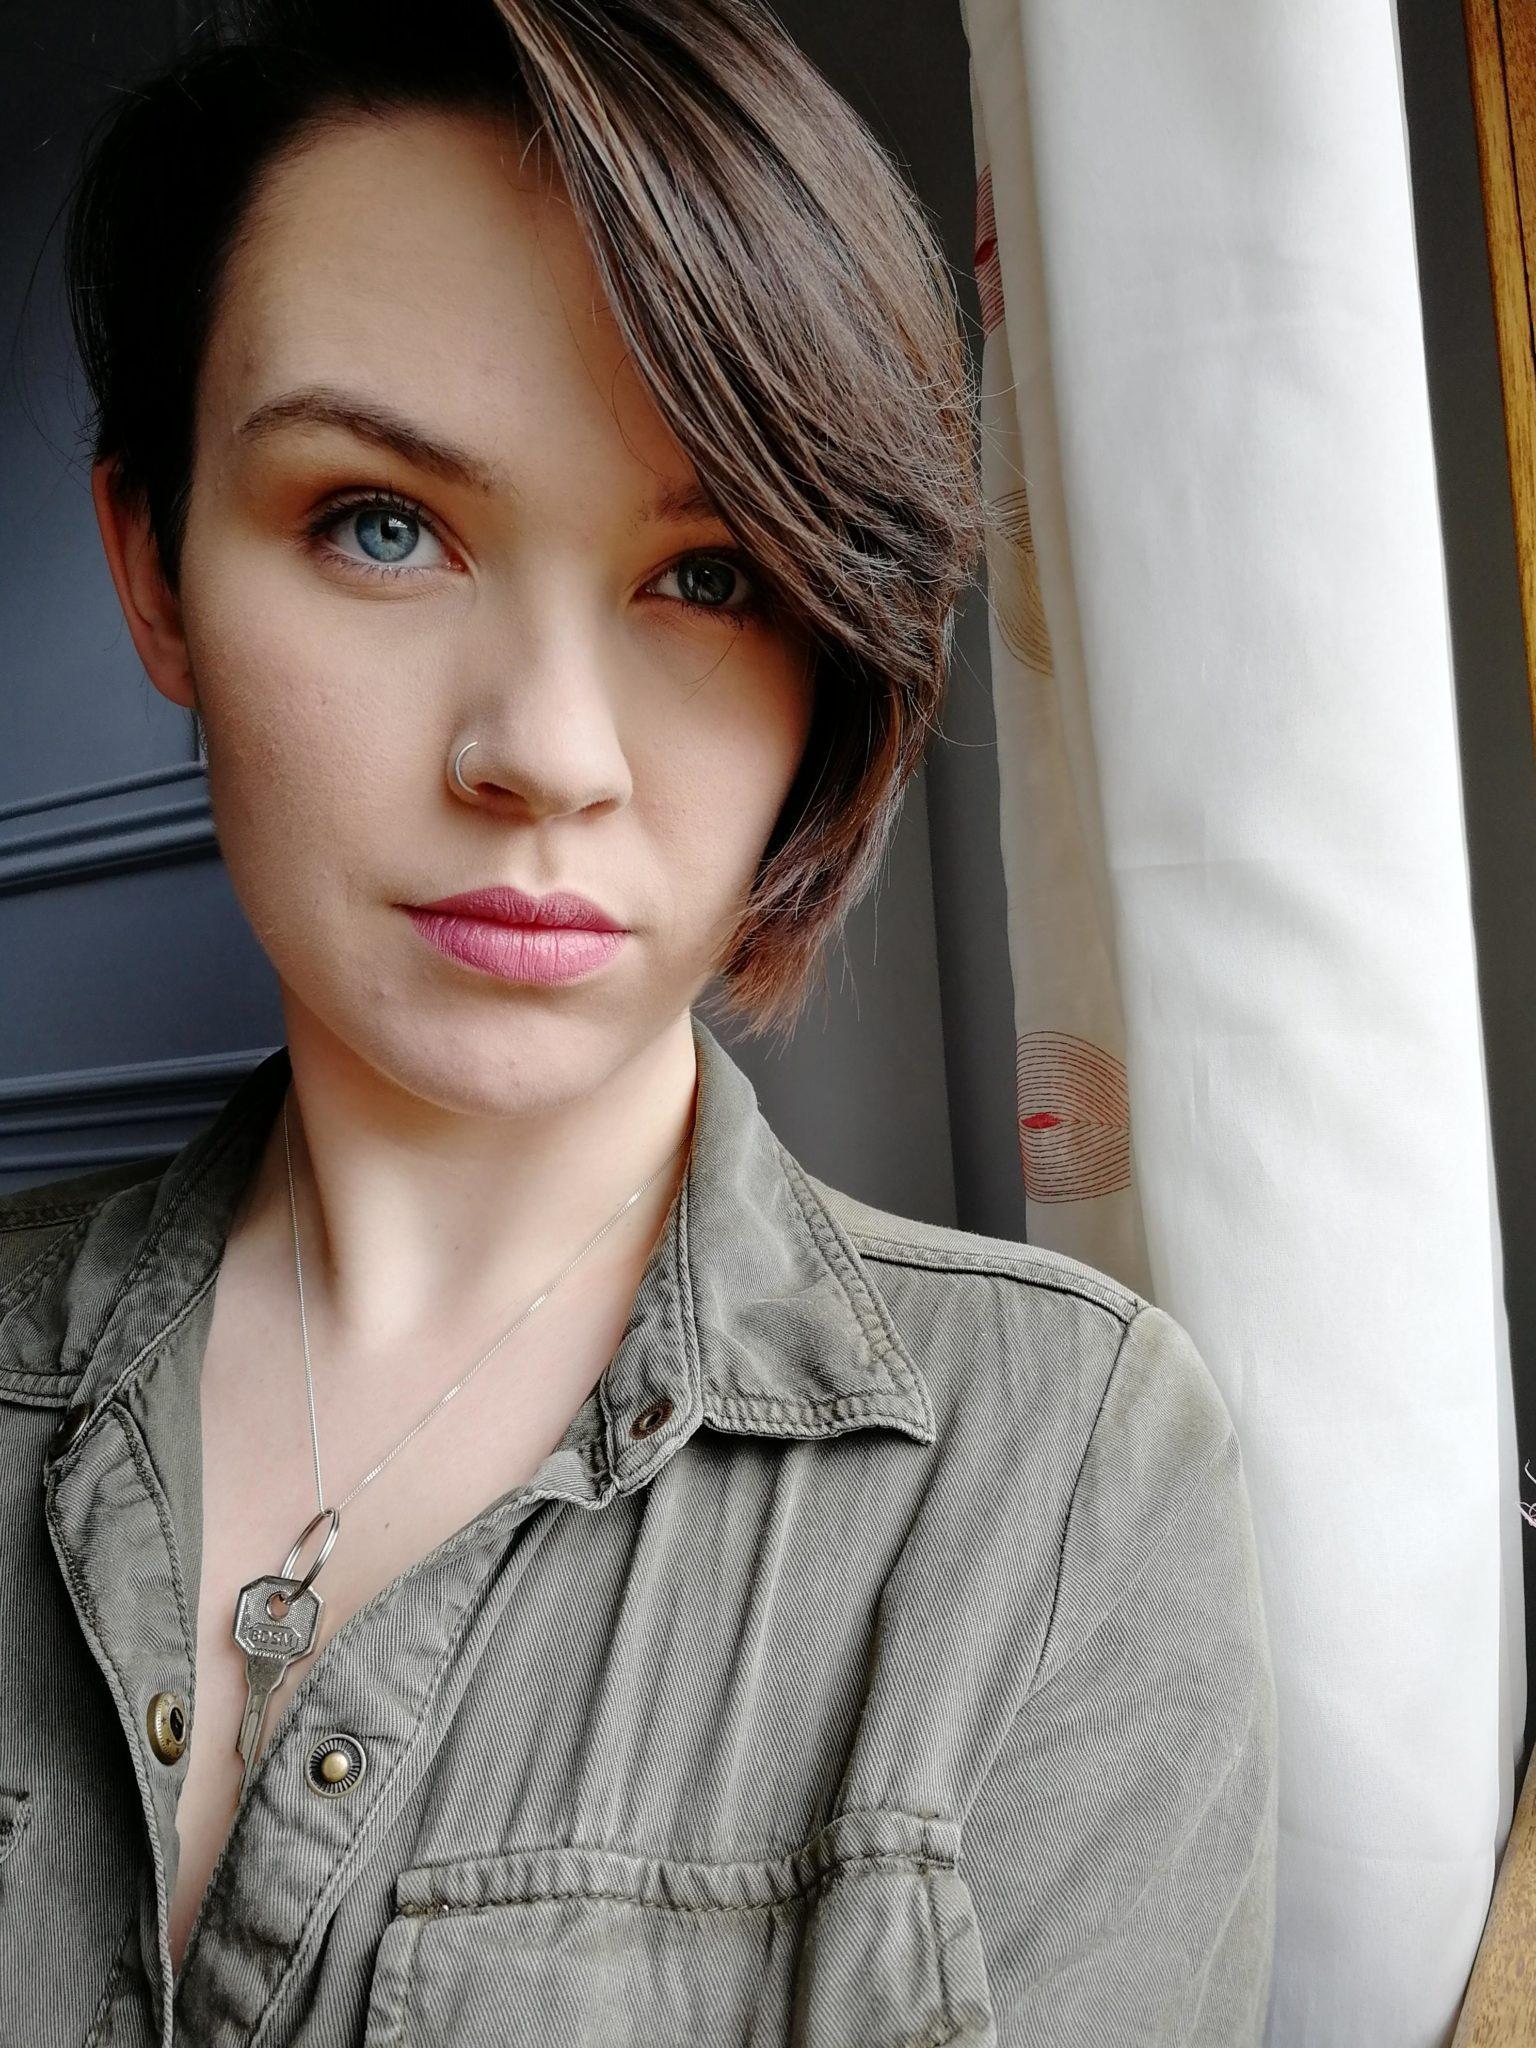 Chastity Keyholder Miss Kat - image British-Chastity-Keyholder-2-scaled on https://blackcockcult.com